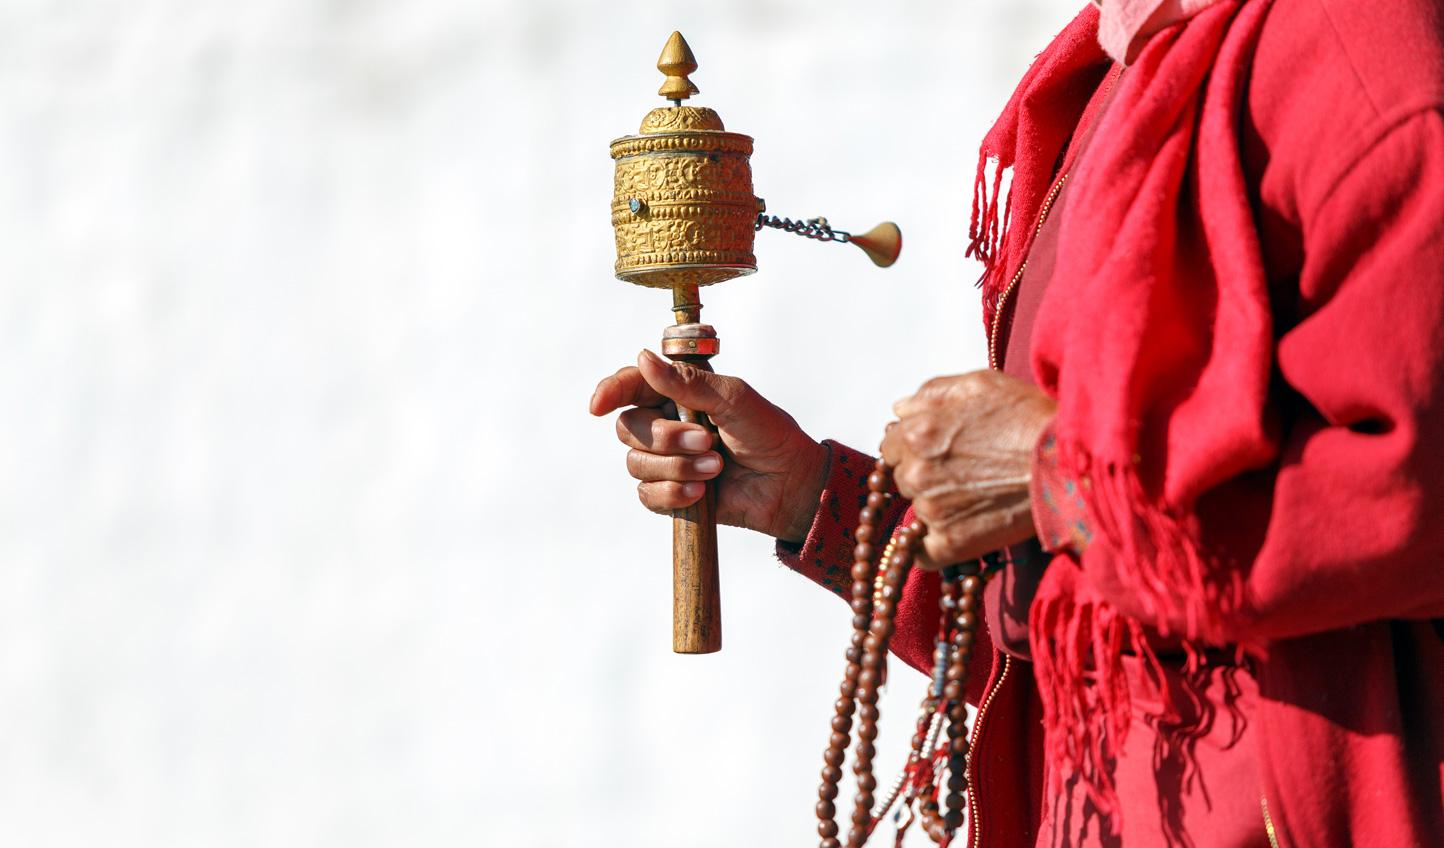 Unlock your spiritual side in Bhutan